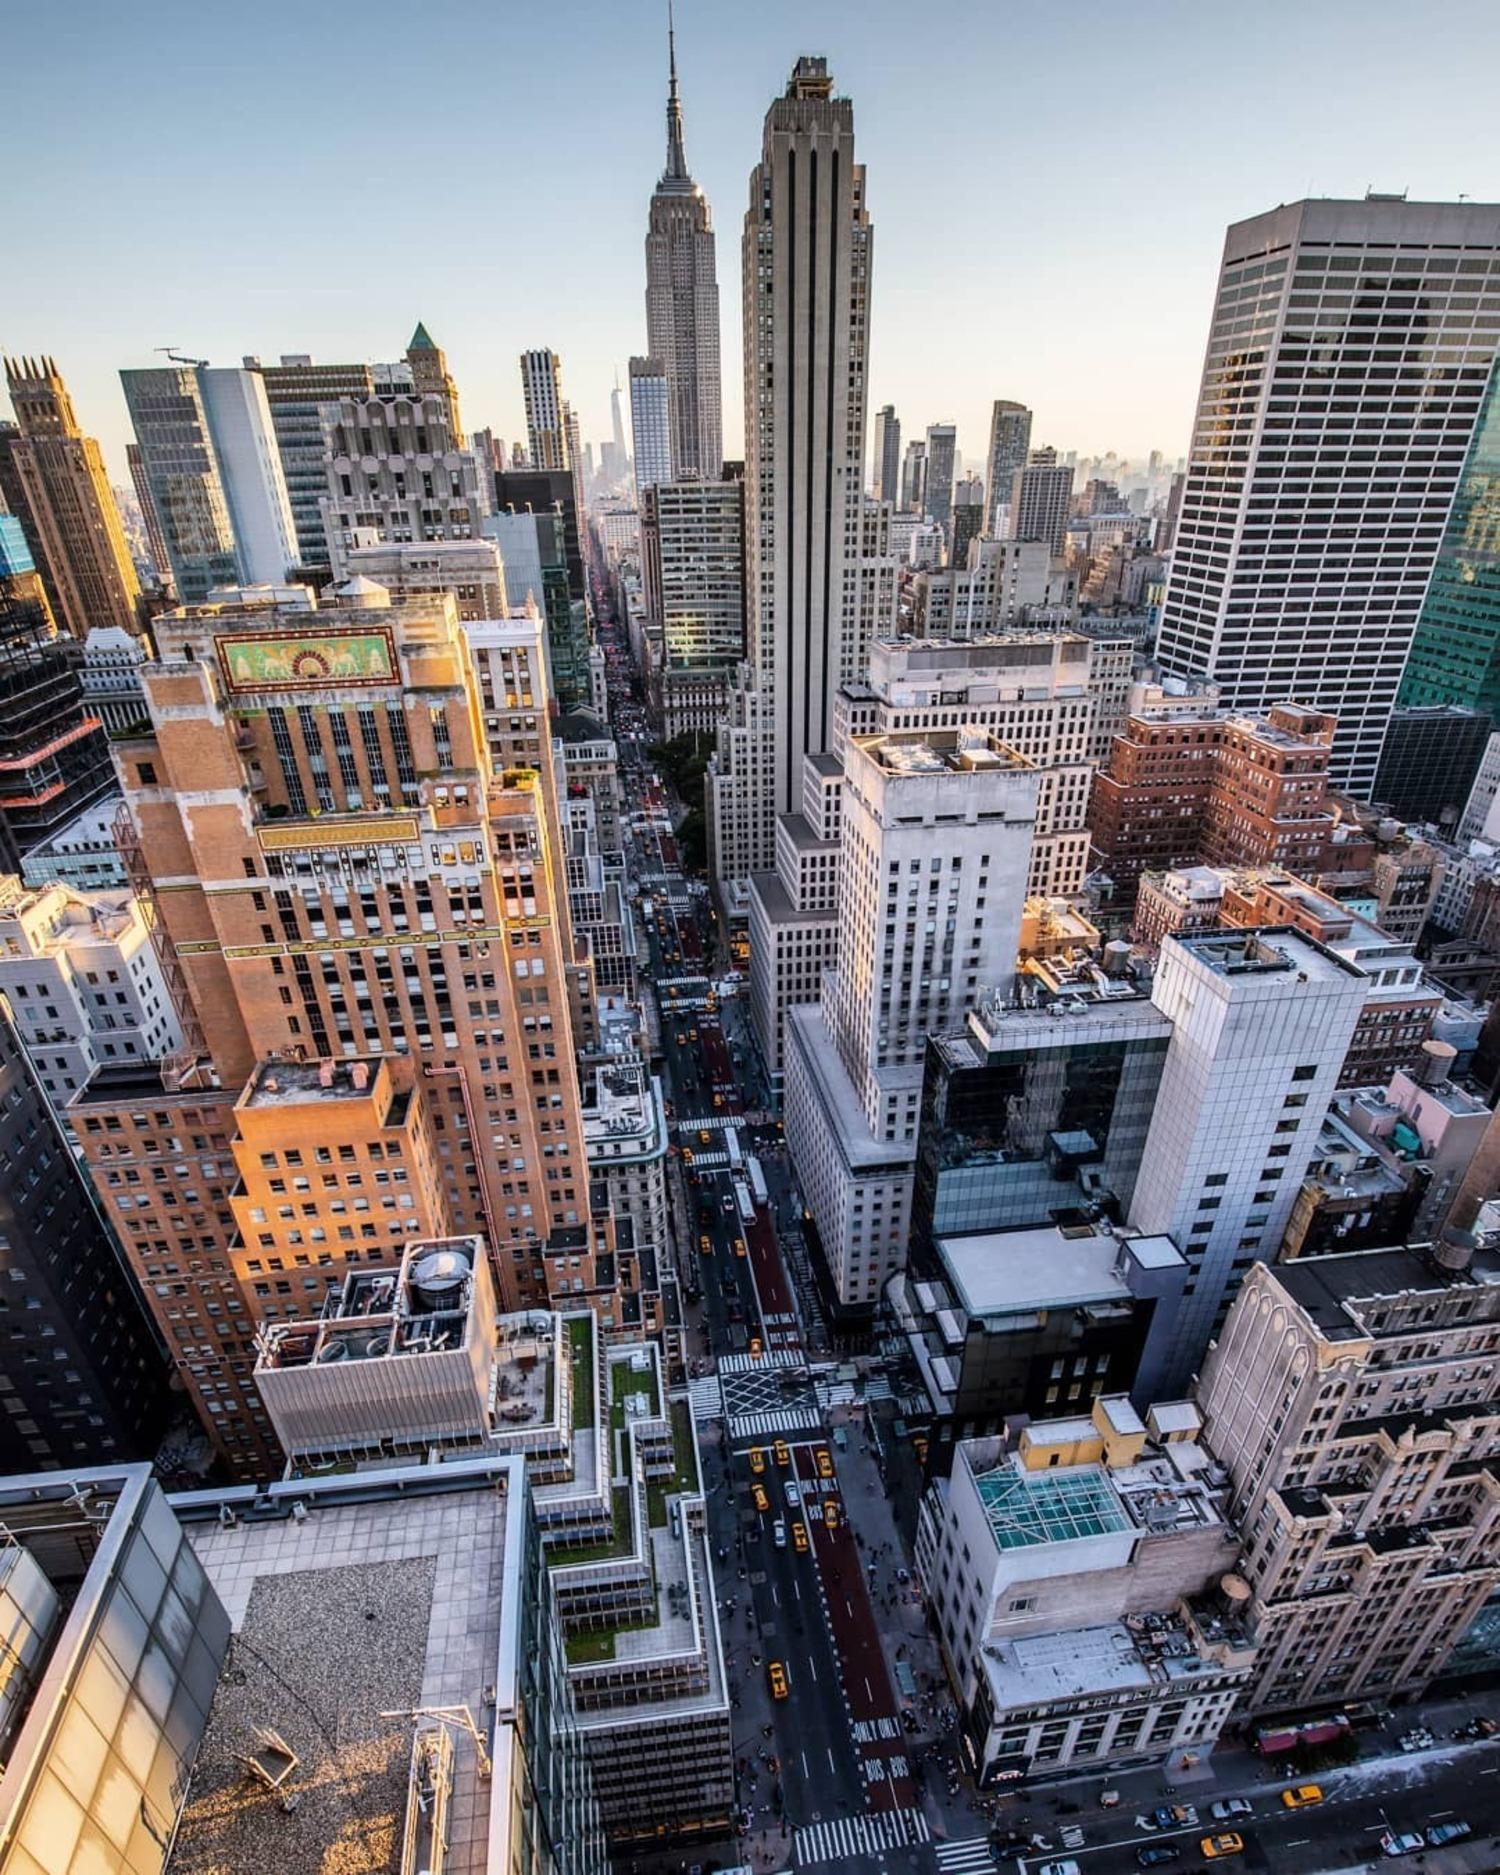 34th Street, New York, New York